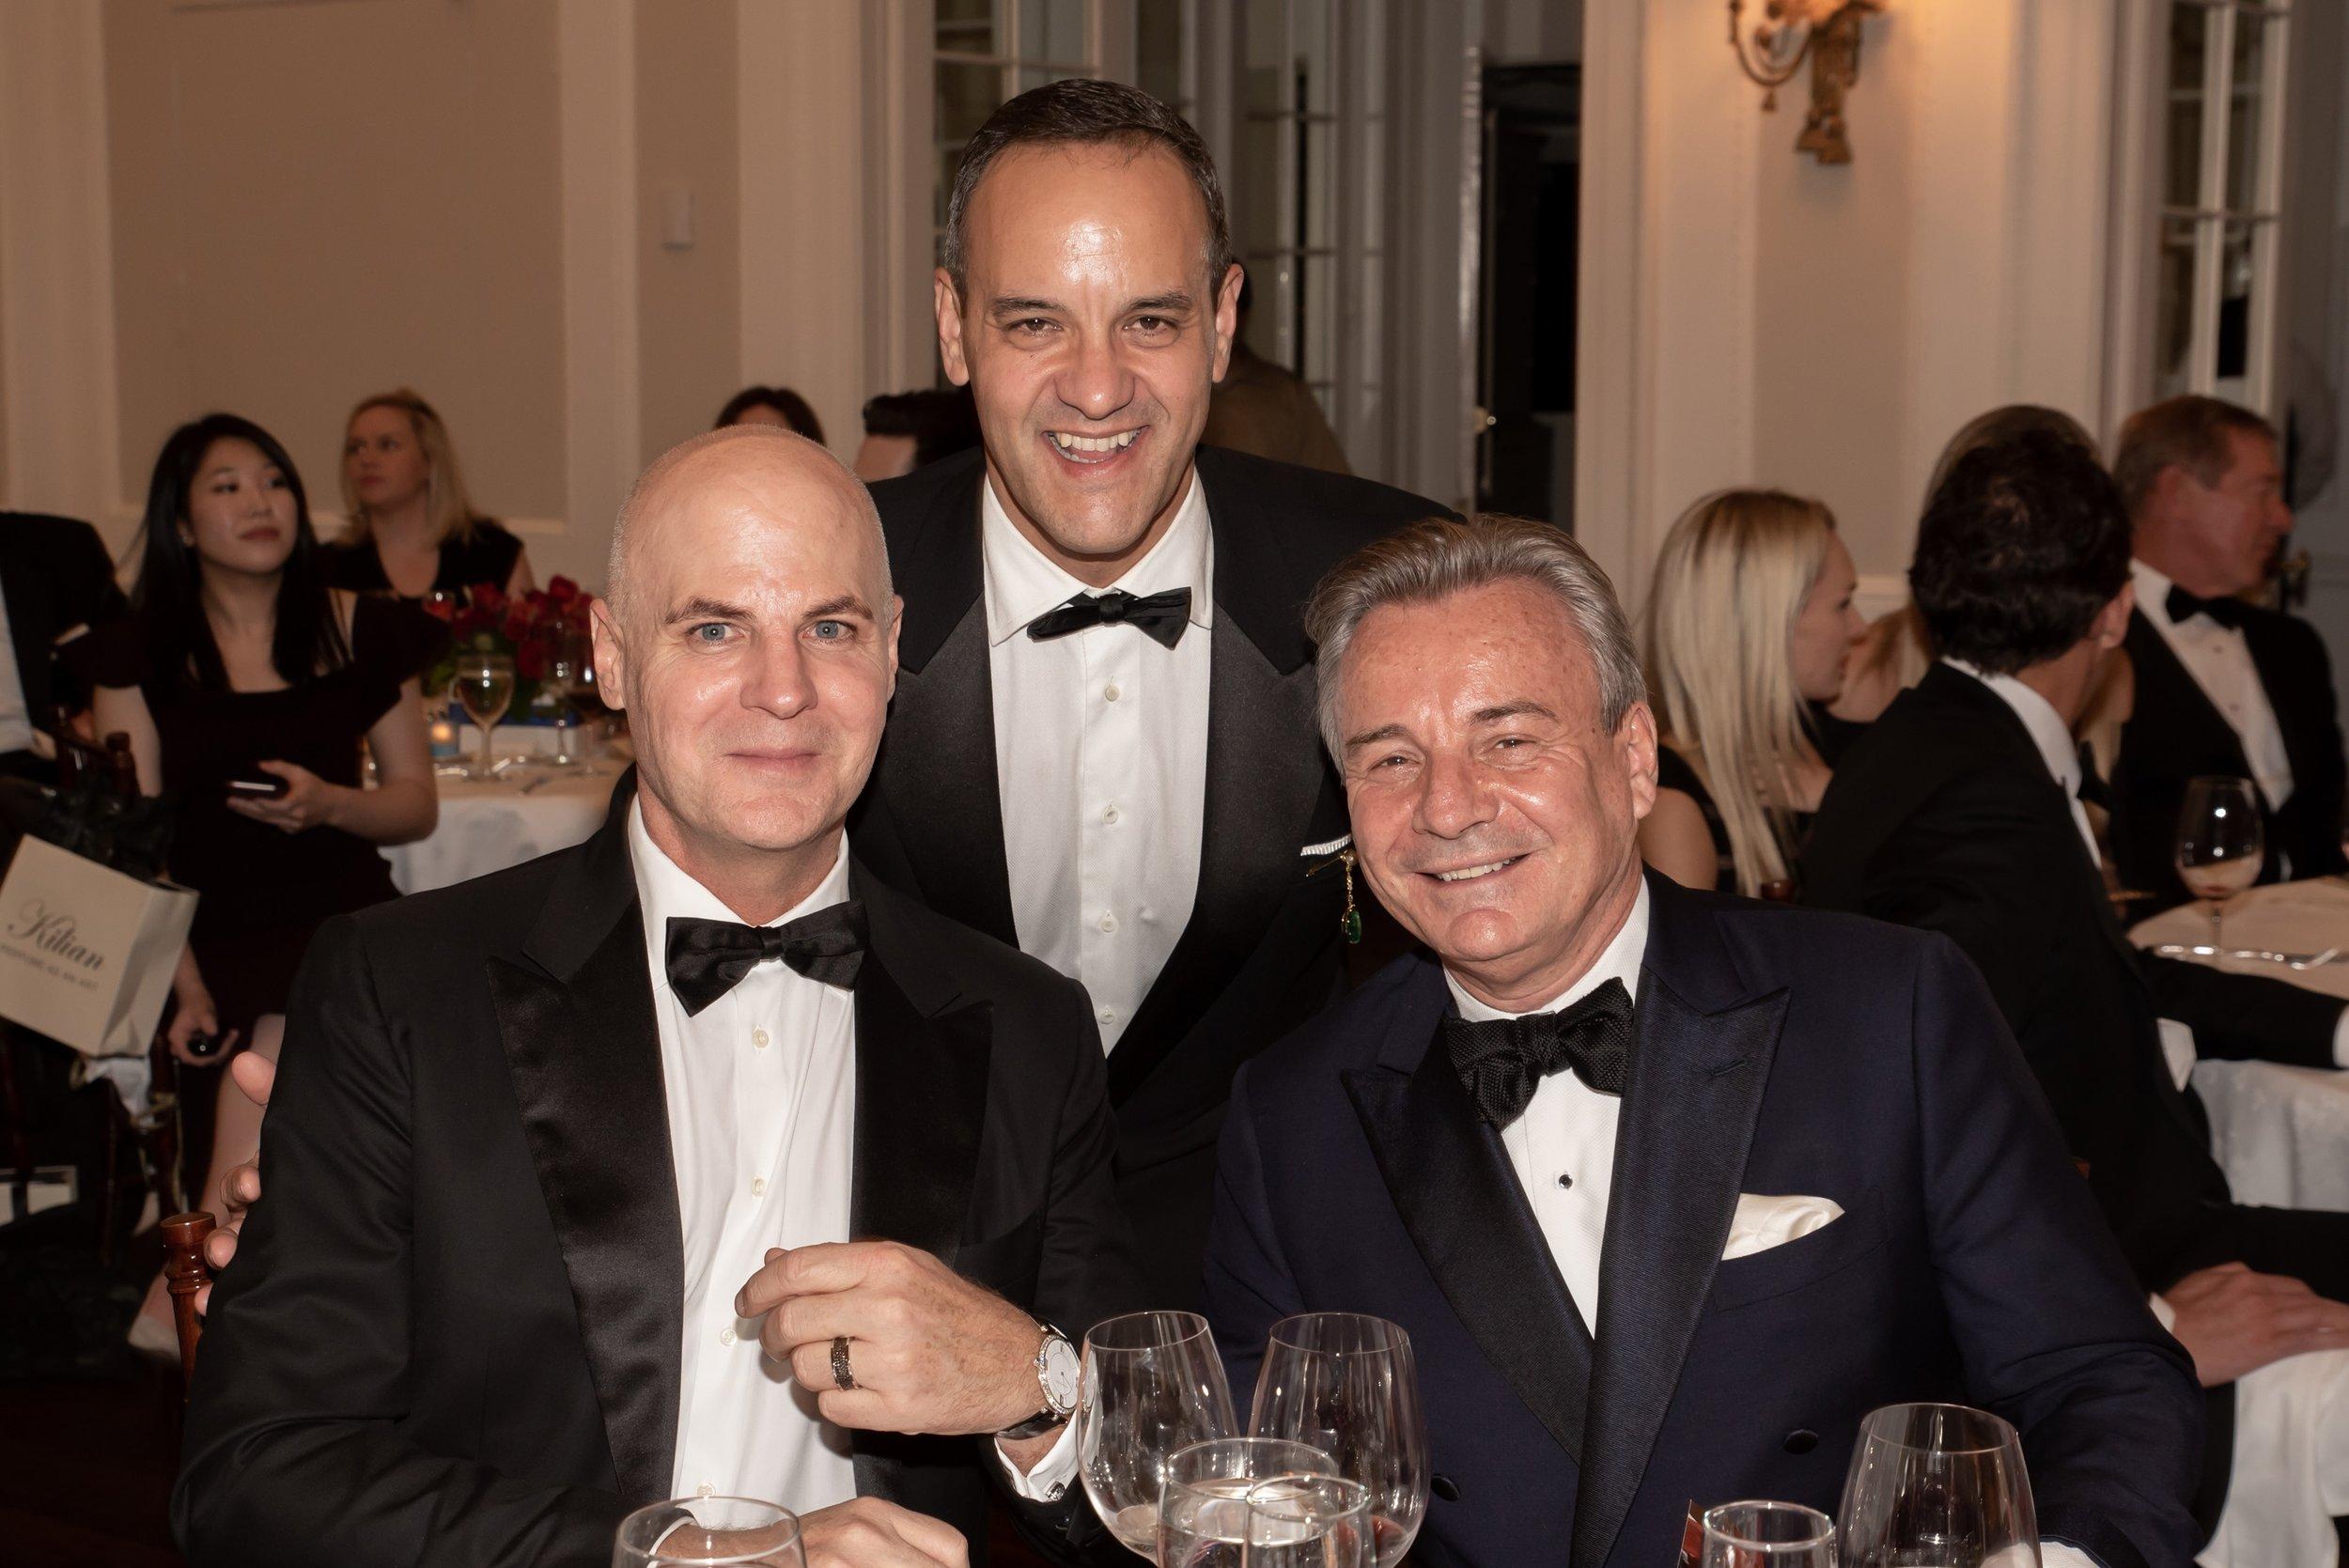 Jerry Erickson, Benigno Aguilar, Franck Laverdin